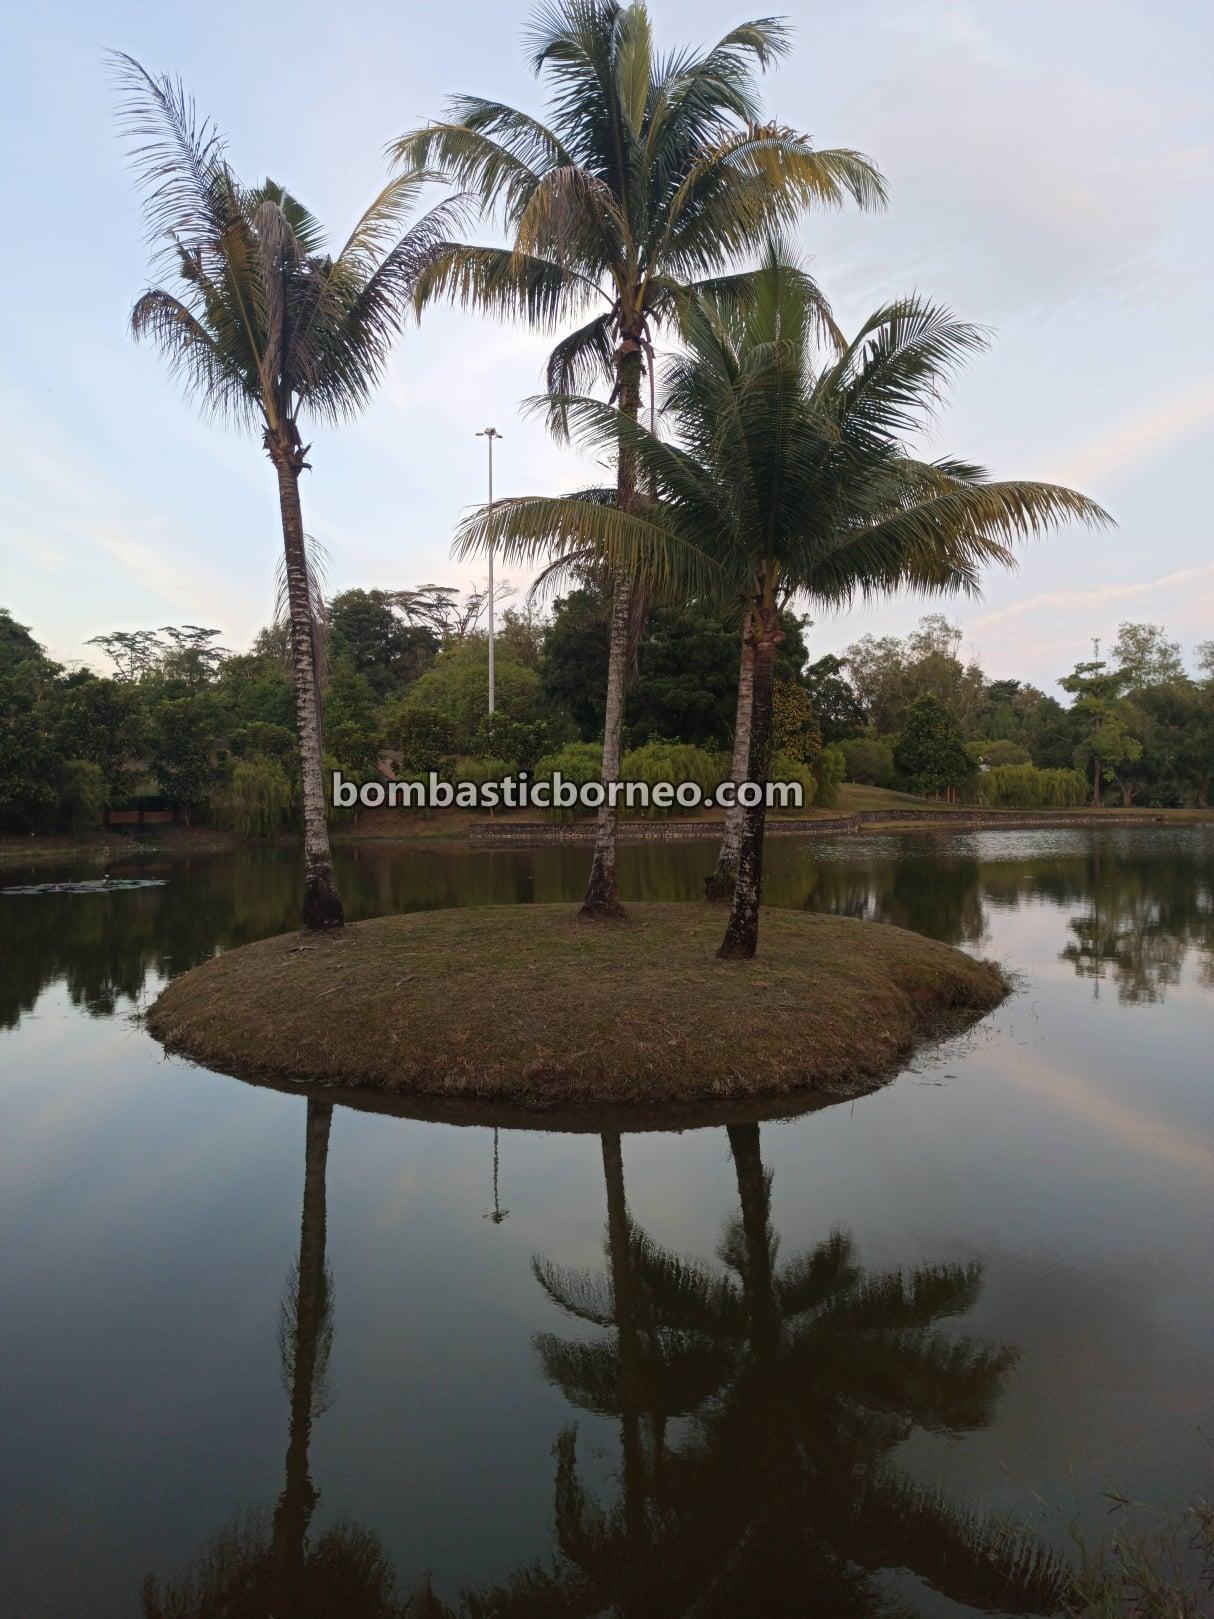 Sarawak Botanical Garden, recreational park, tempat senaman, outdoor, exercise, healthy, jogging, destination, exploration, Malaysia, manmade lake, Tourism, tourist attraction, 马来西亚砂拉越, 古晋旅游景点